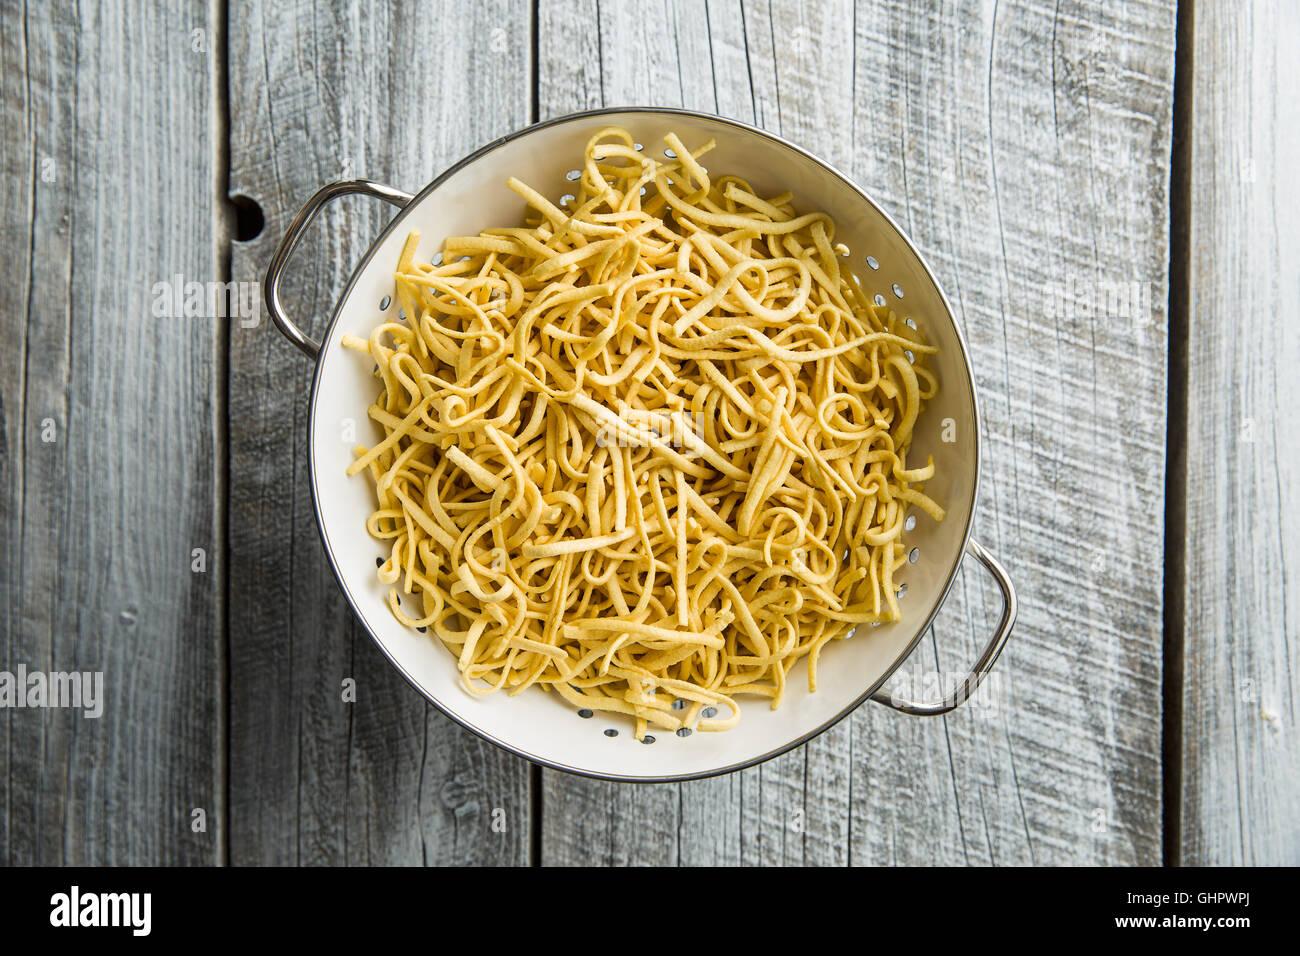 Tasty spaetzle pasta in colander. - Stock Image